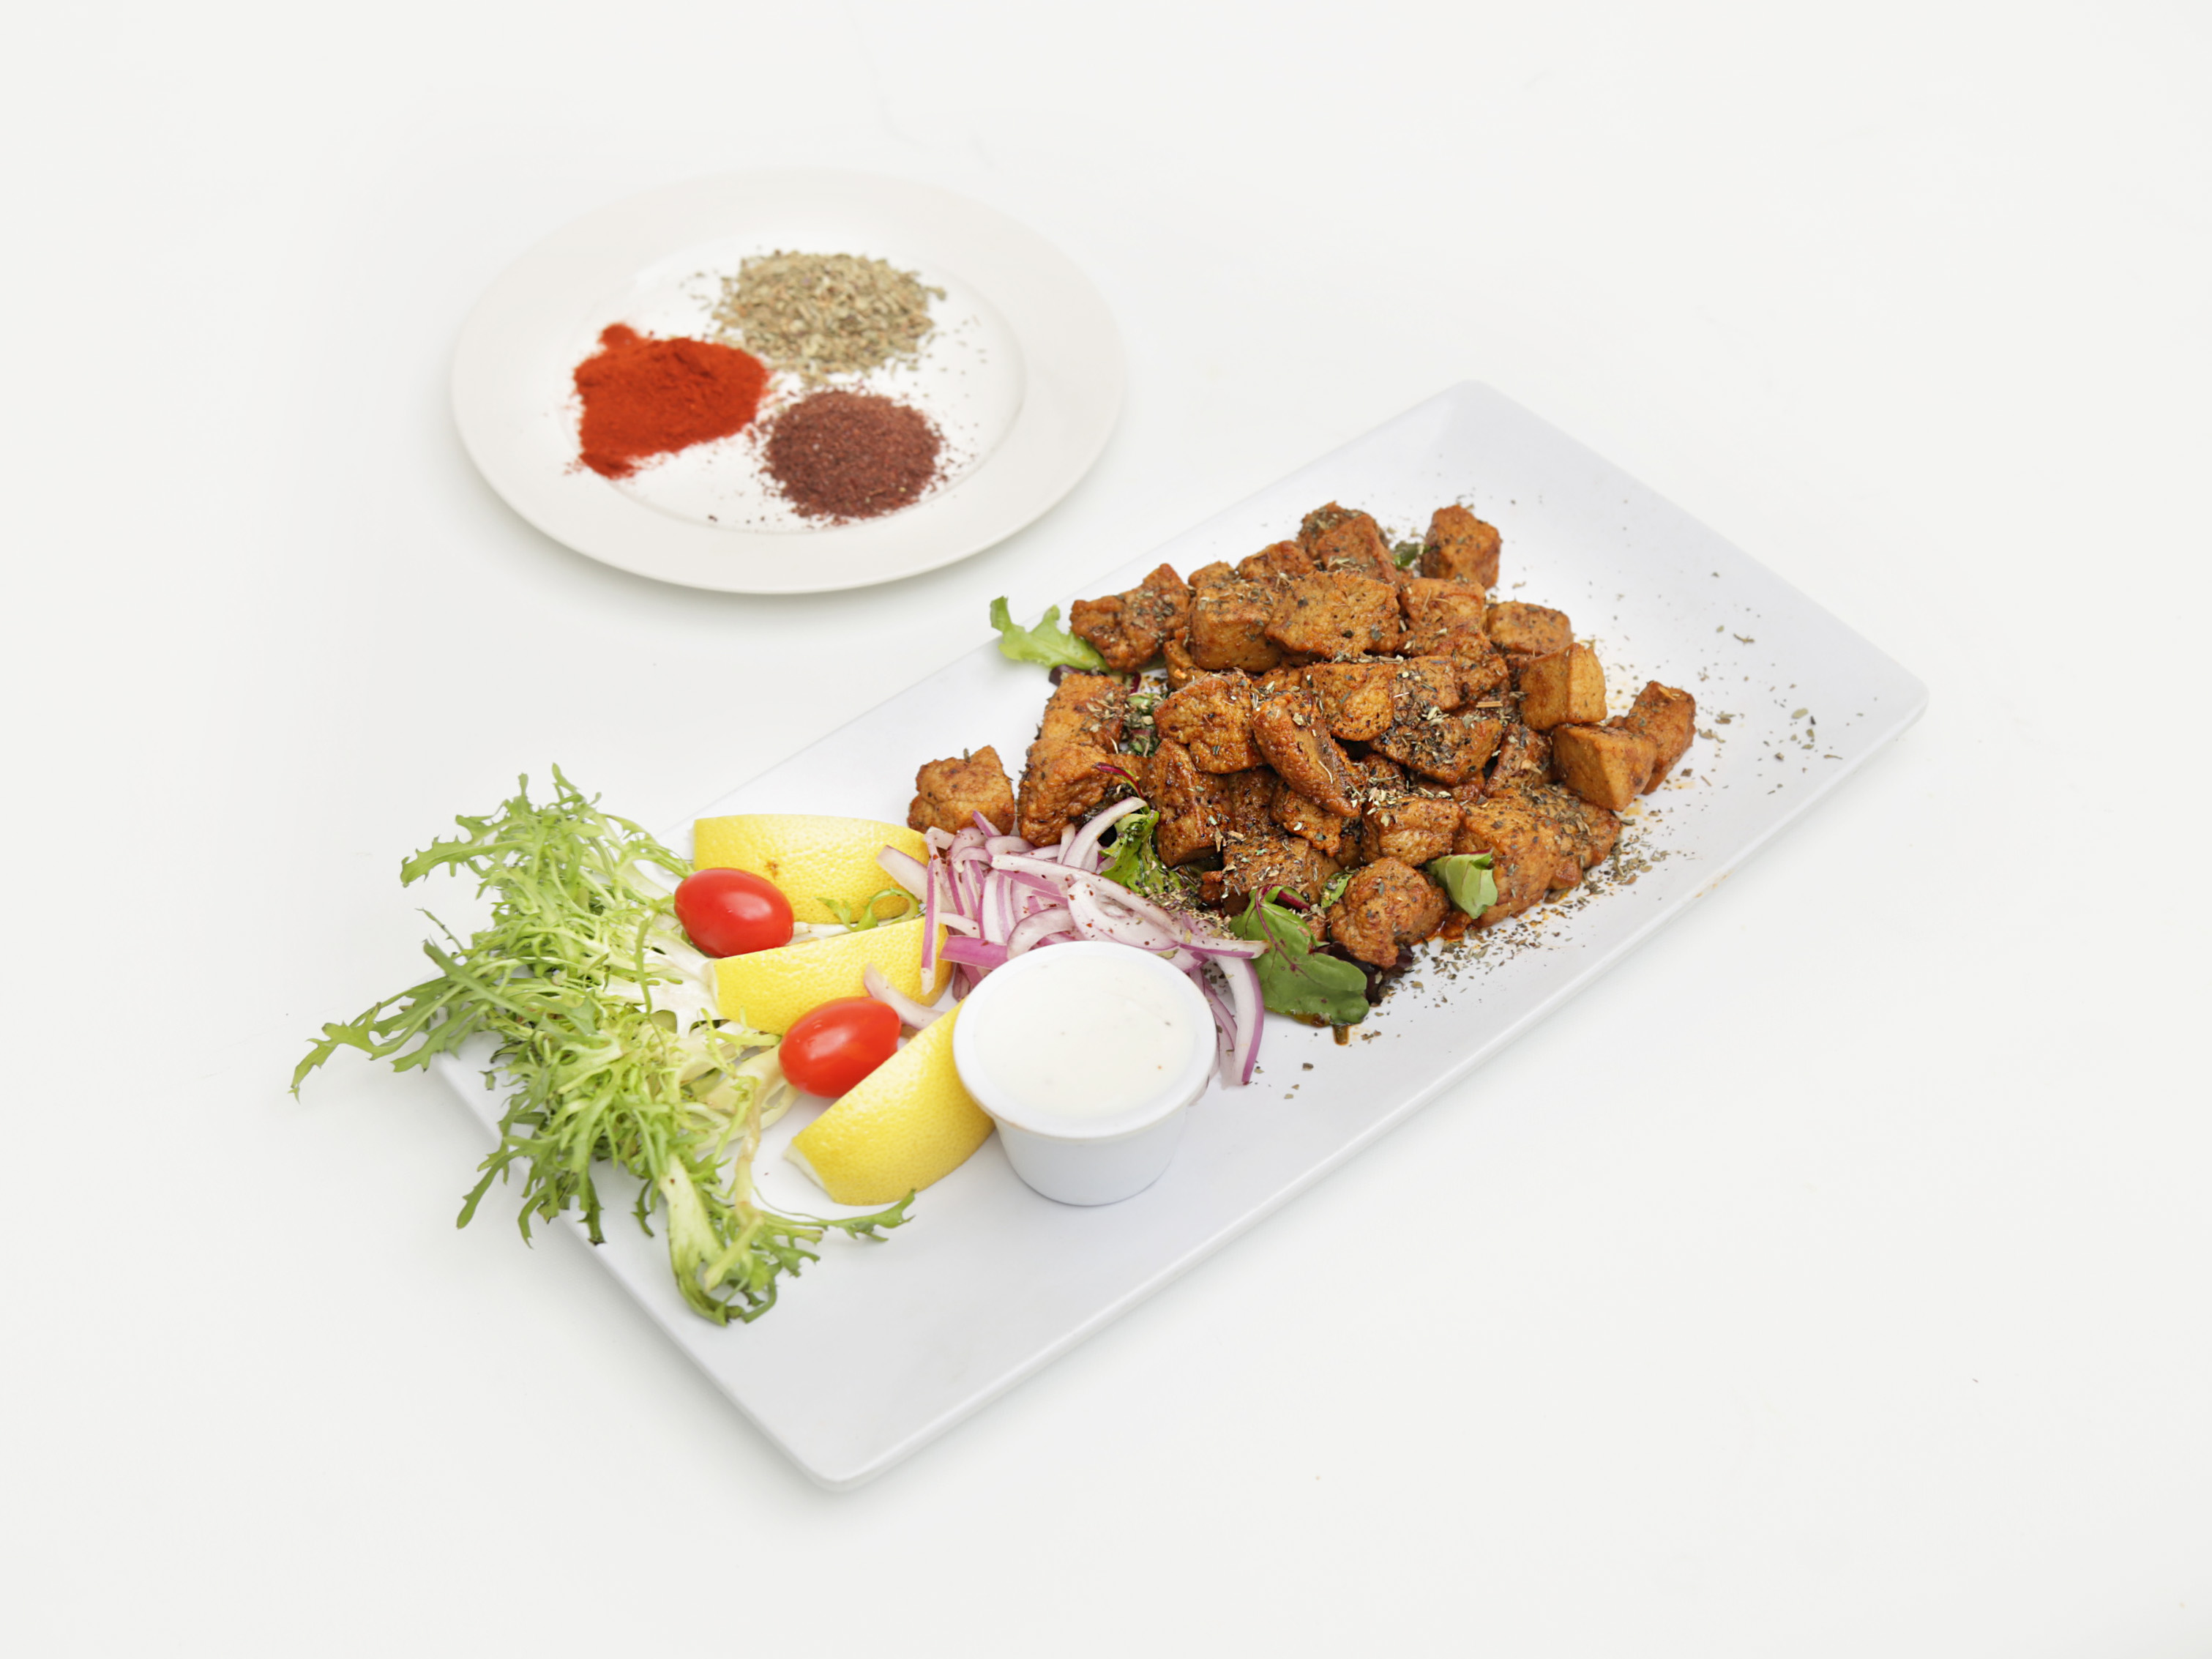 Turkish-Style Liver